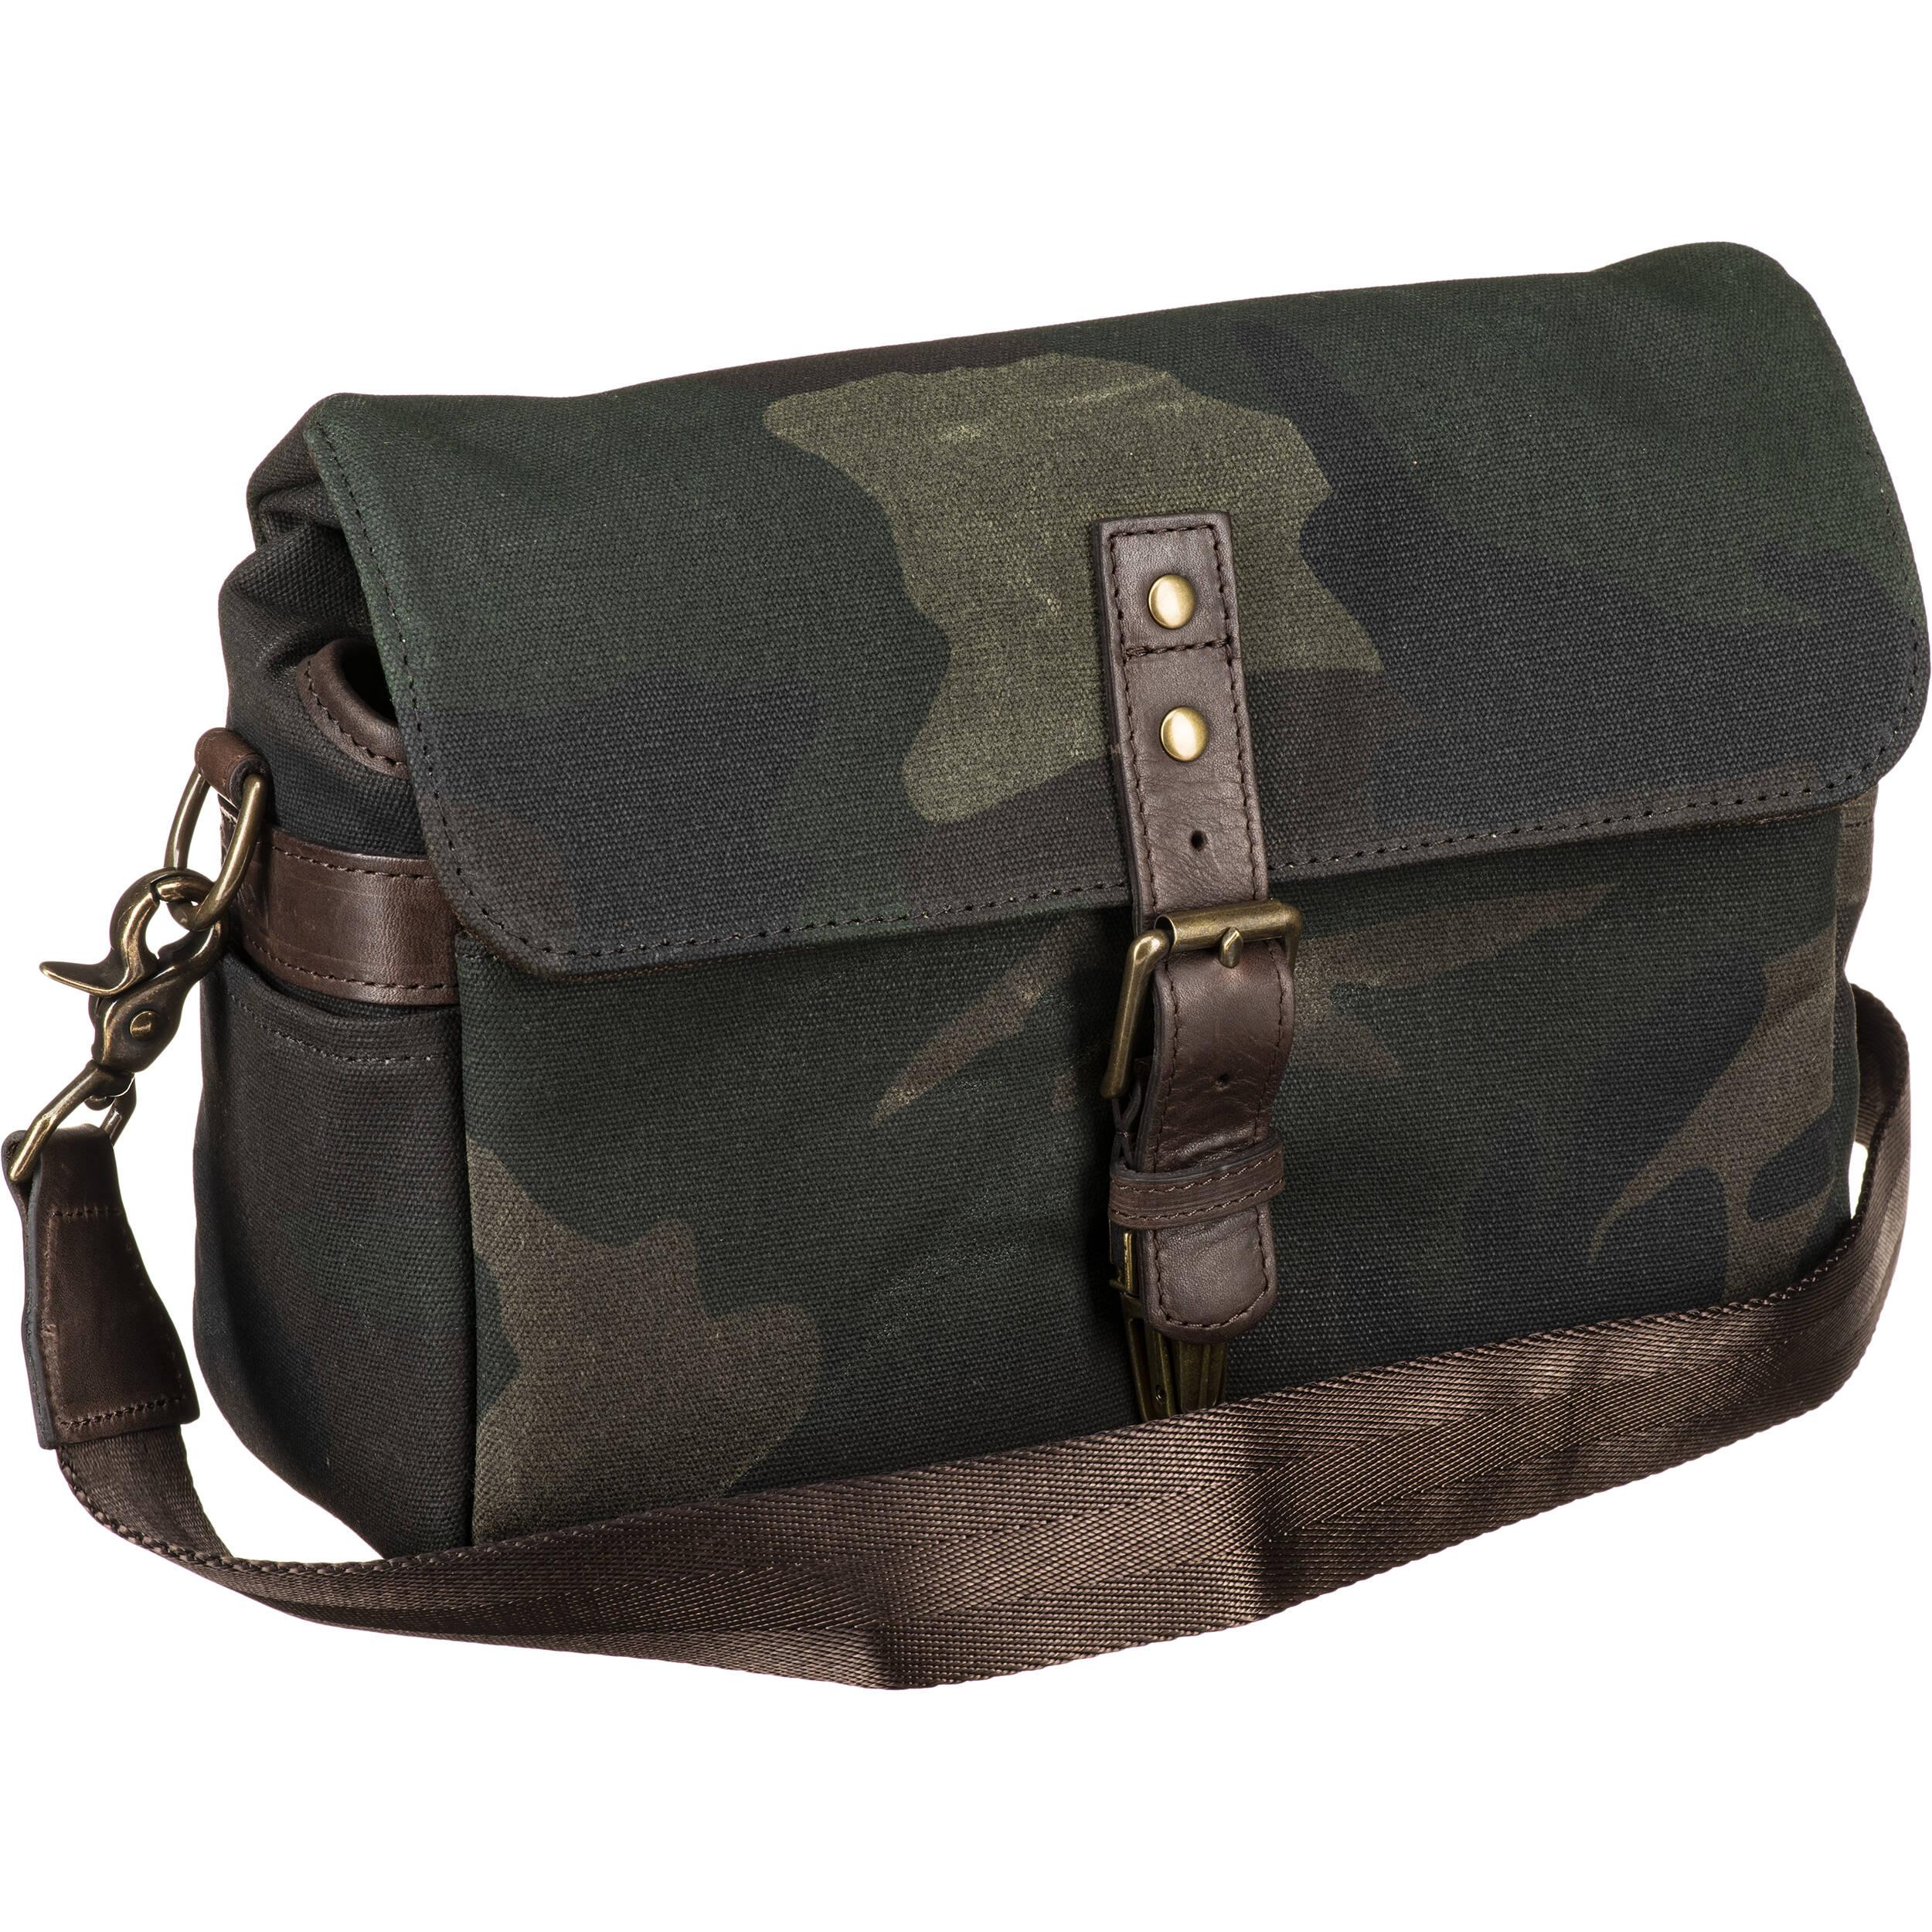 Ona Bowery Camera Bag Canvas Camouflage